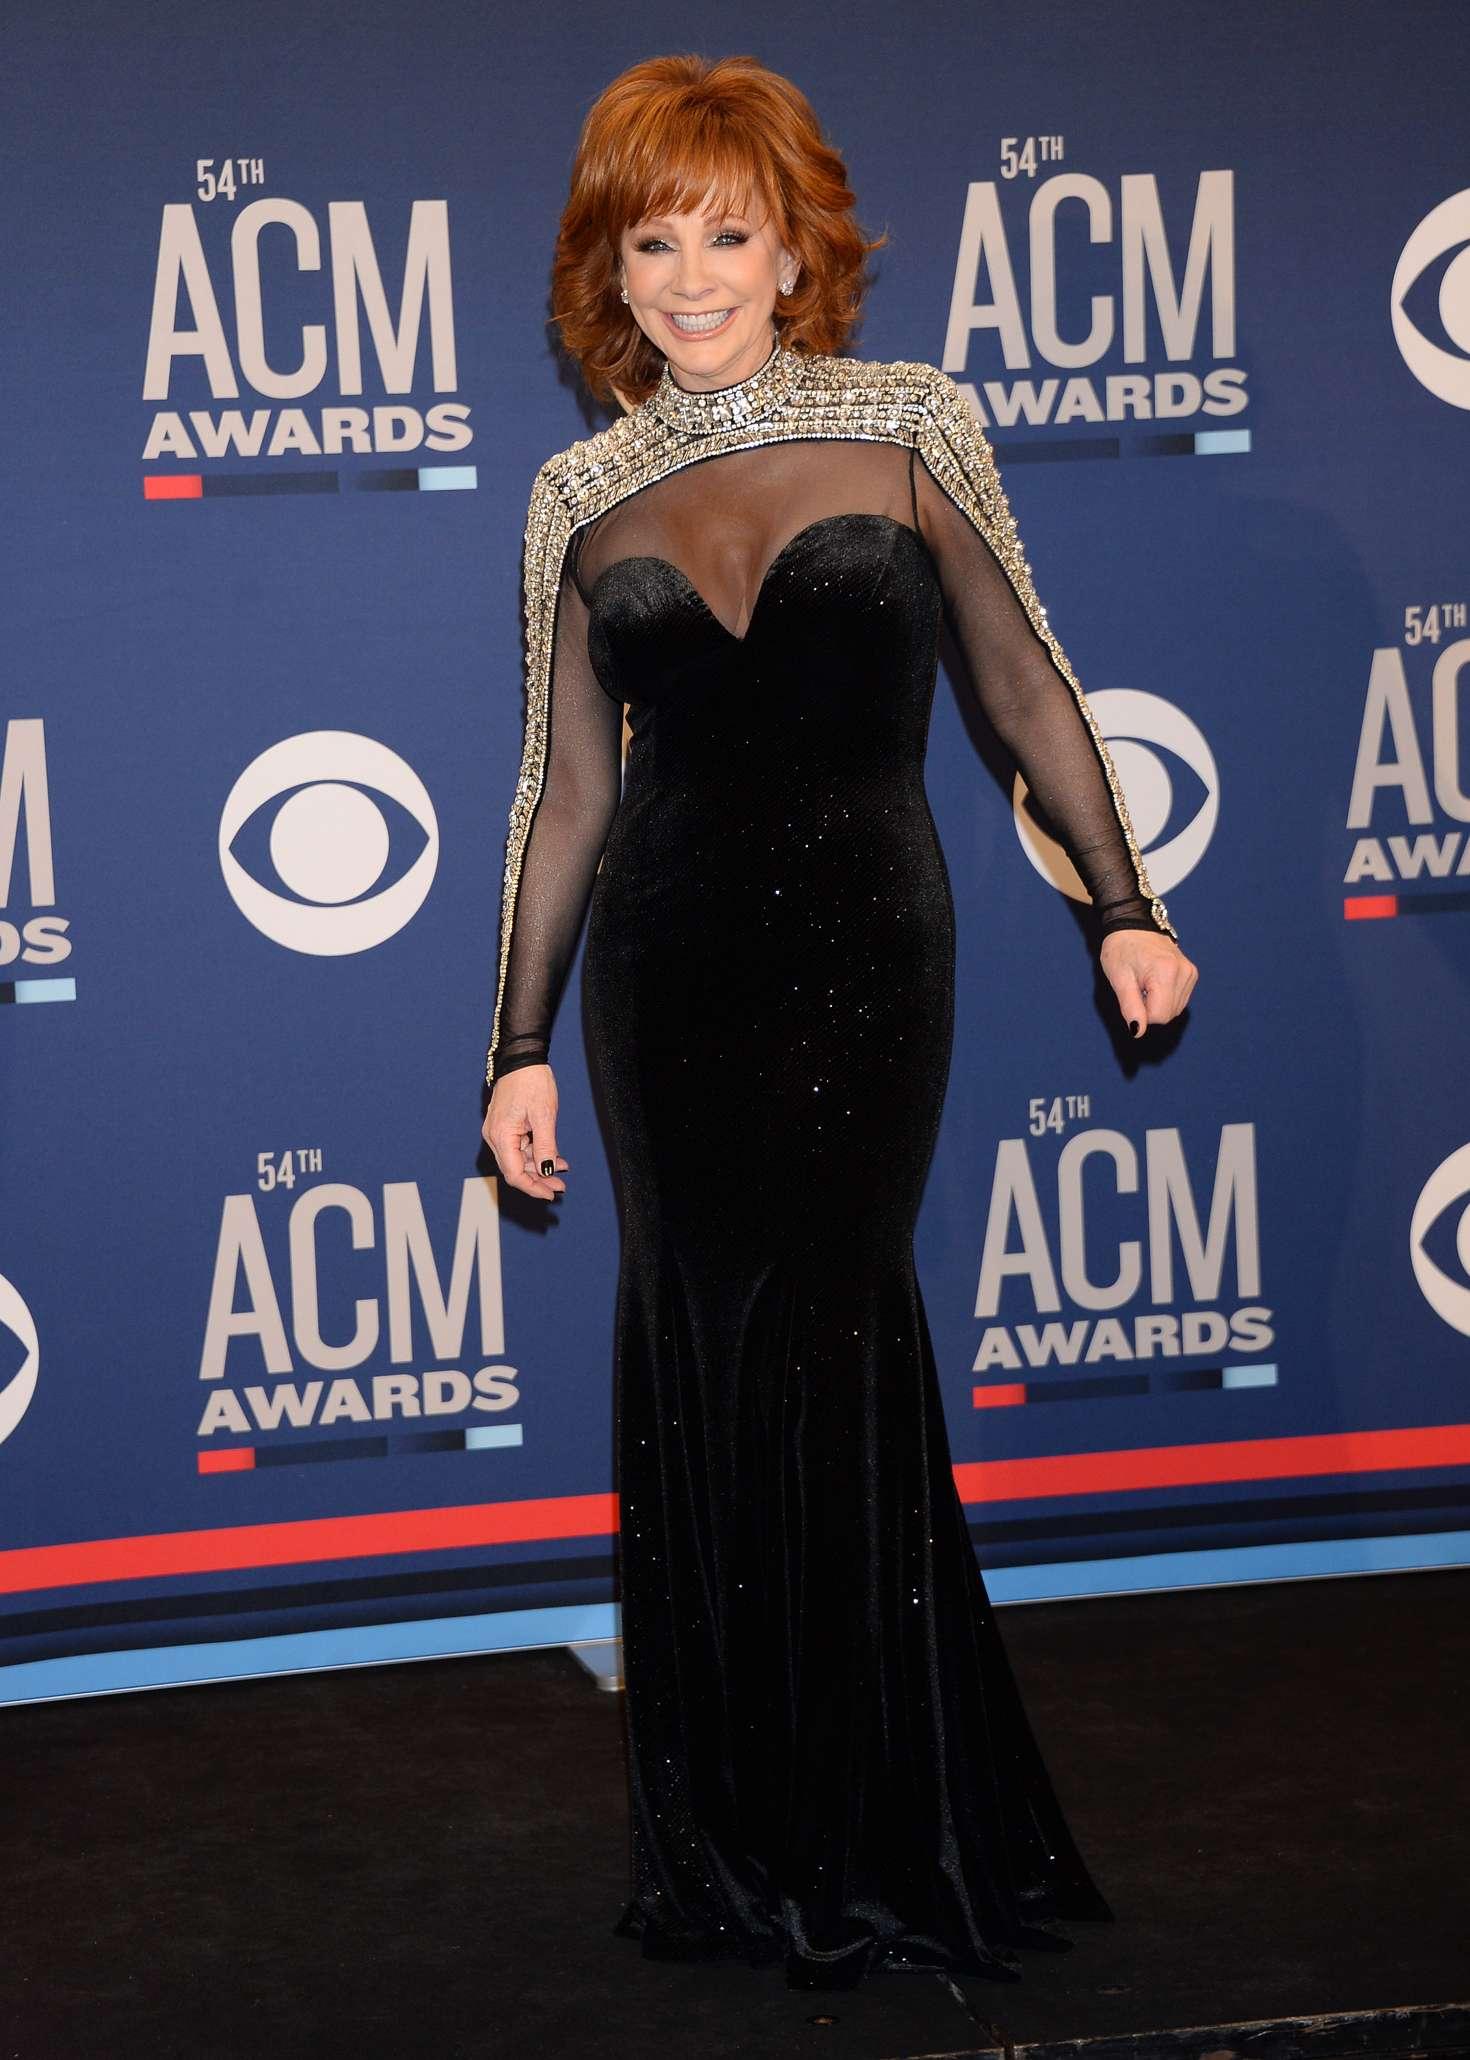 Reba Mcentire 2019 : Reba McEntire: 2019 Academy of Country Music Awards -02